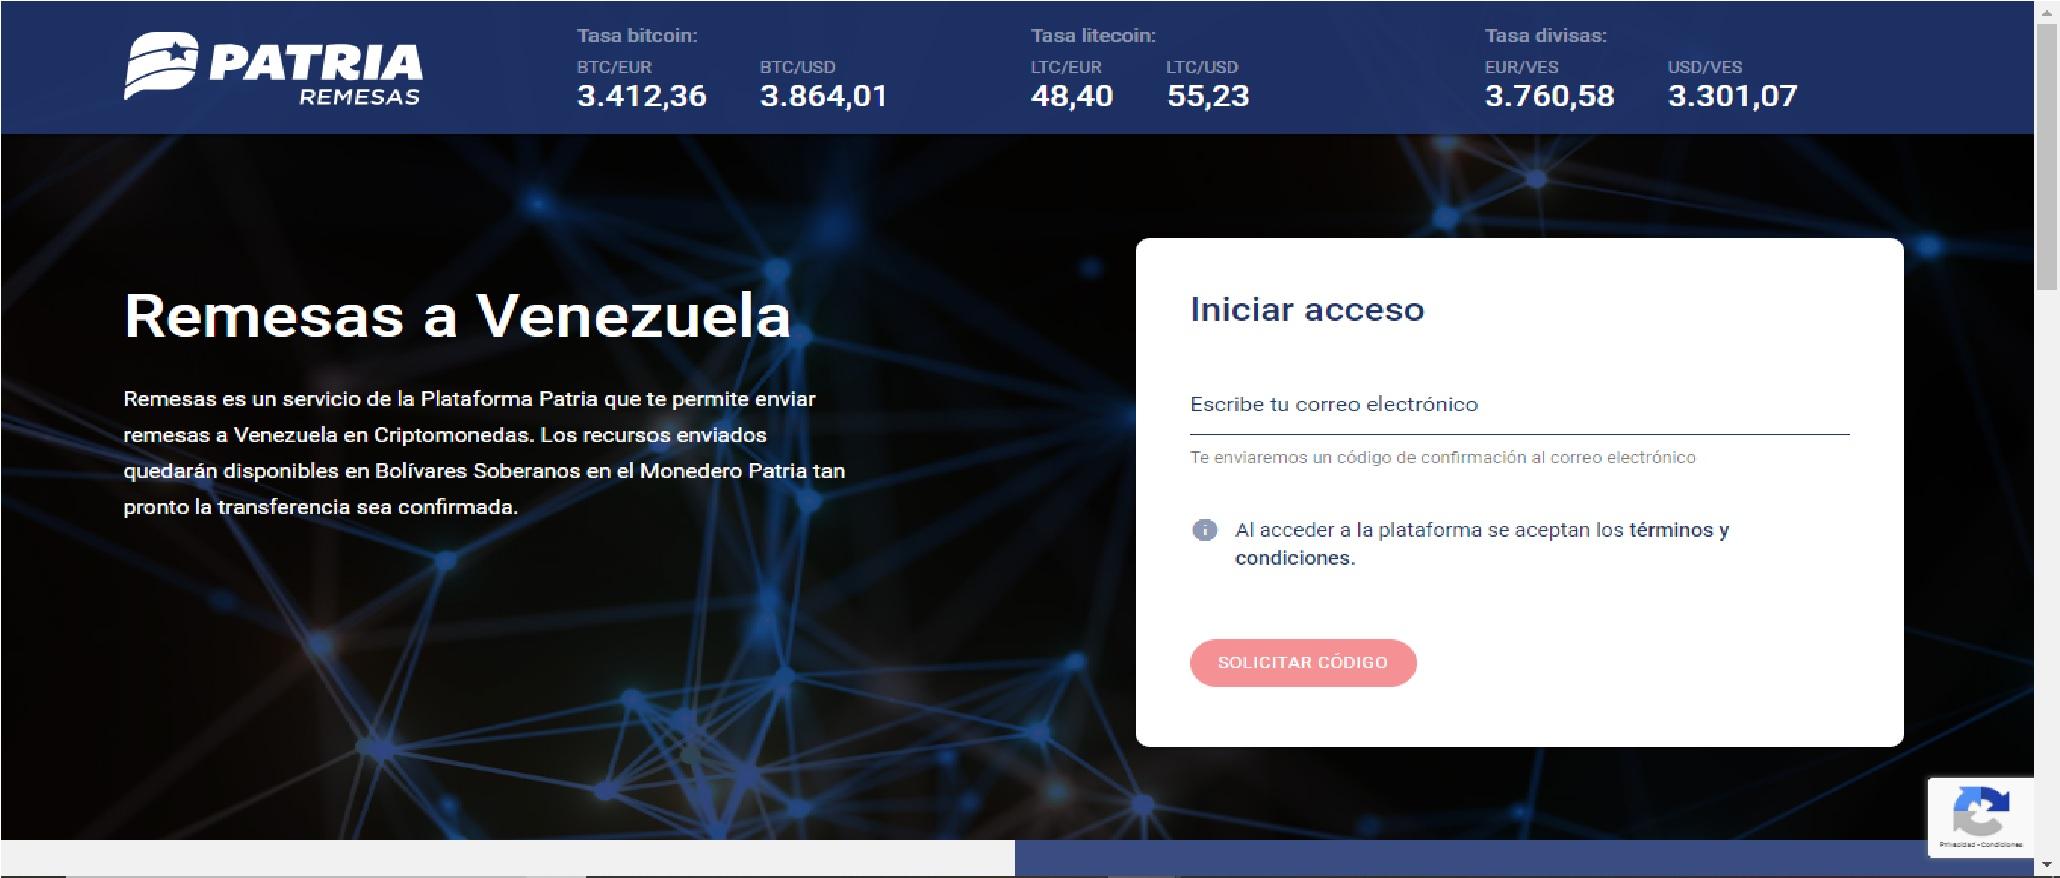 Patria Remesas: la nueva exchange del Estado Venezolano